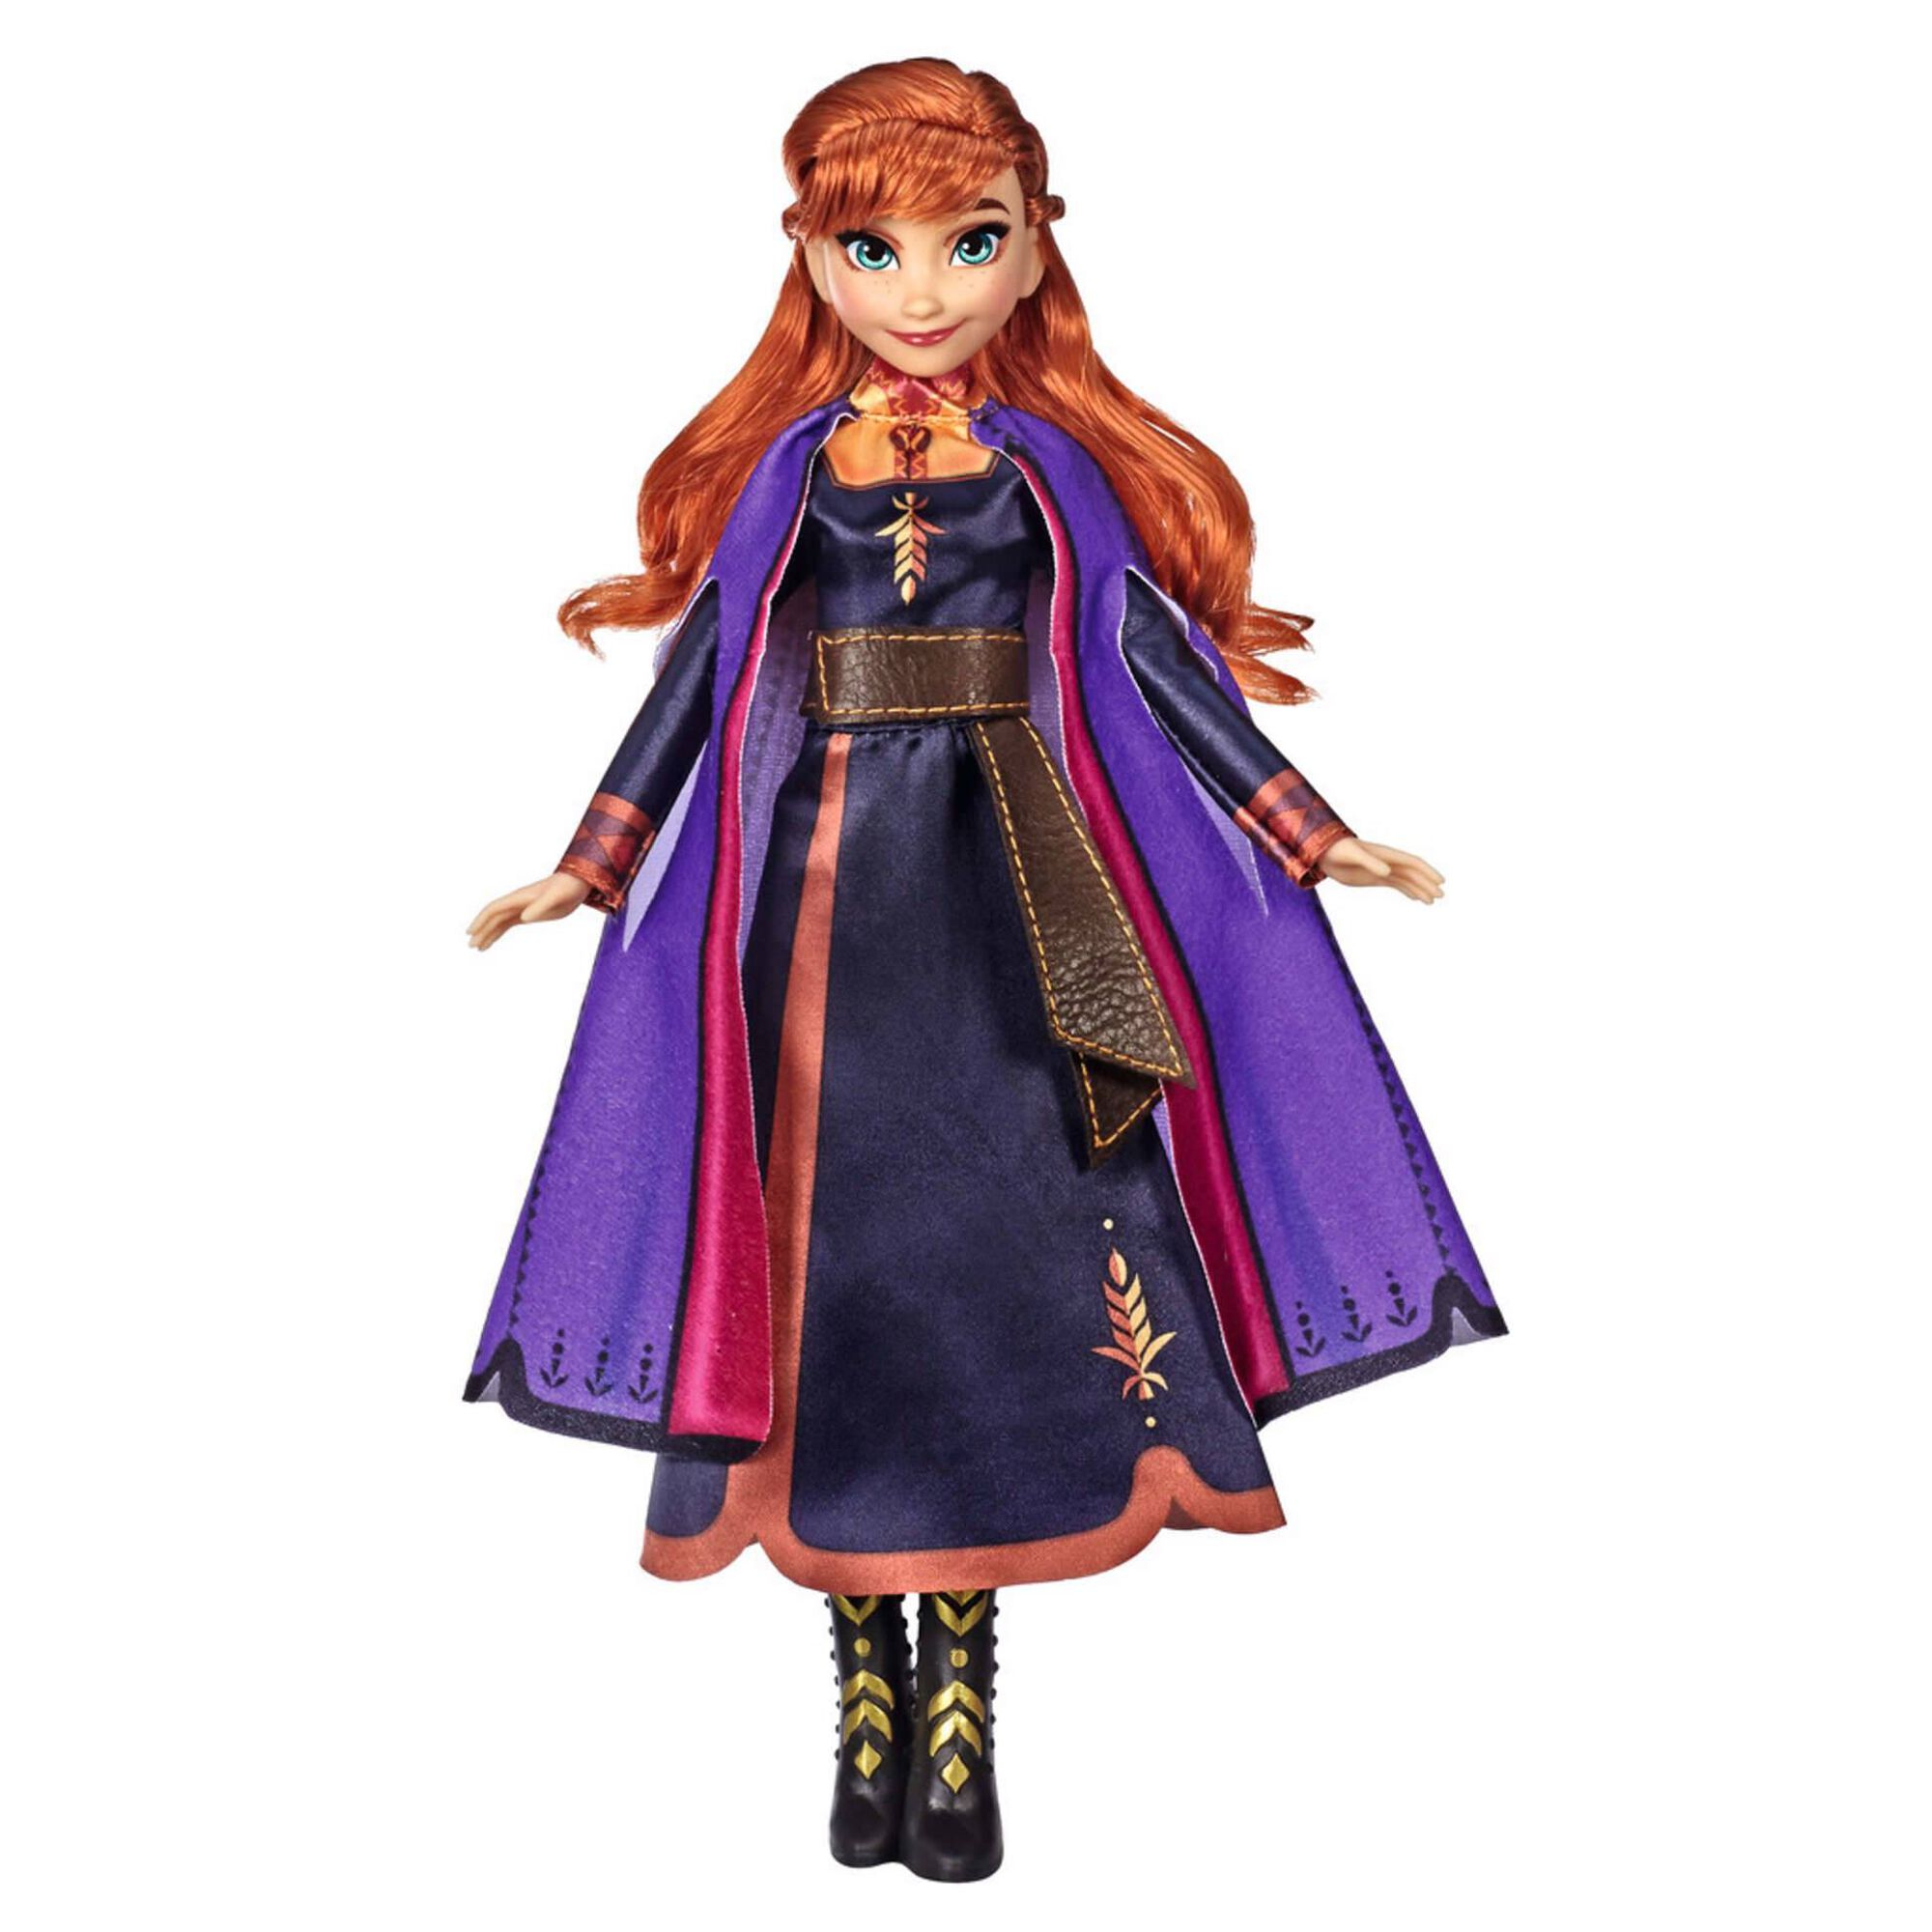 Boneca Musical Frozen 2 Anna